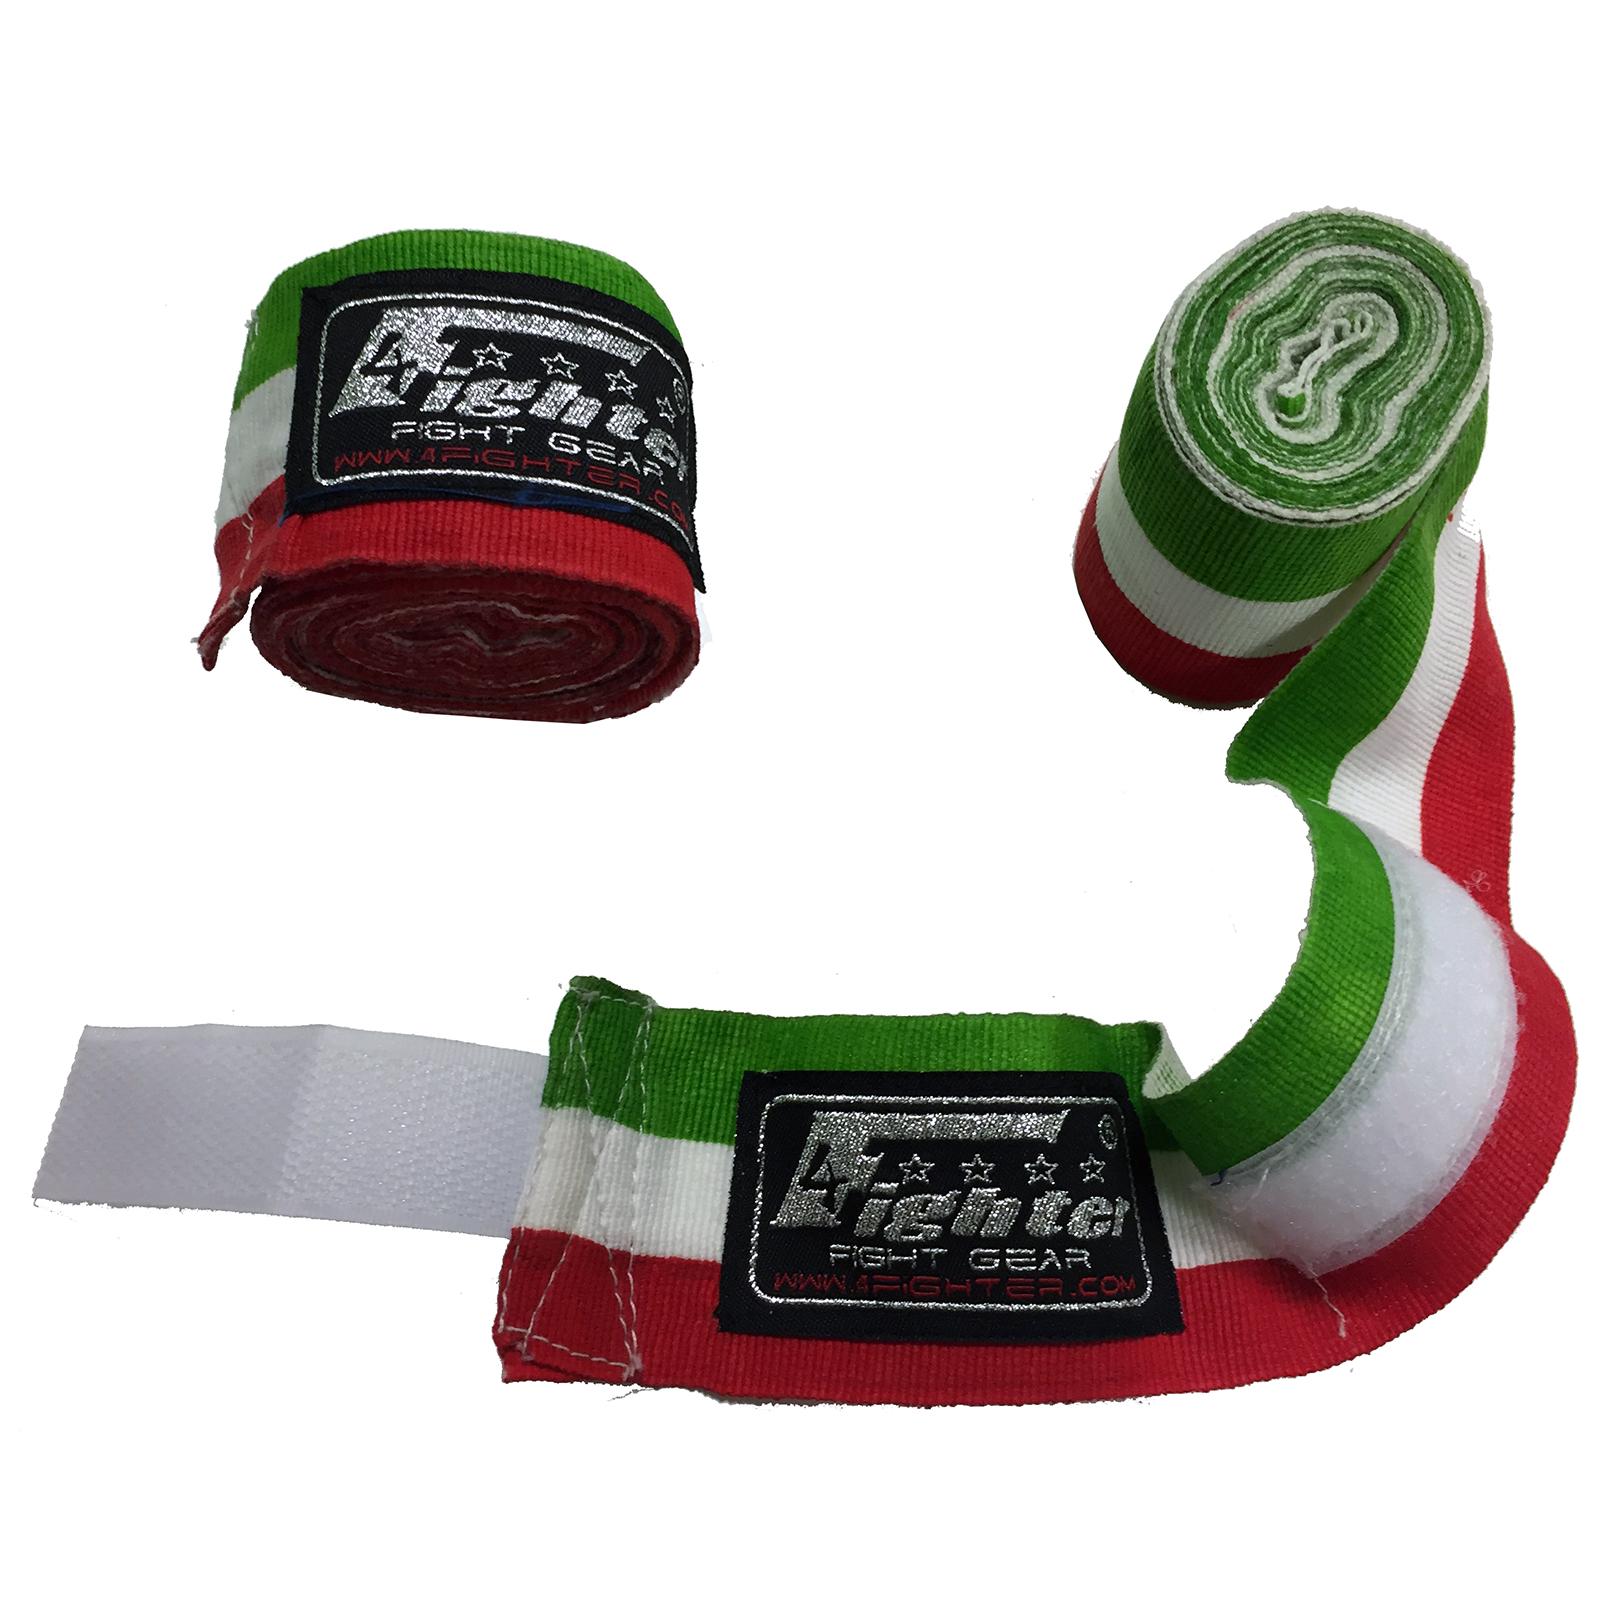 4Fighter Boxbandagen / Hand Bandagen 460cm semi-elastisch Italienflagge grün weiss rot